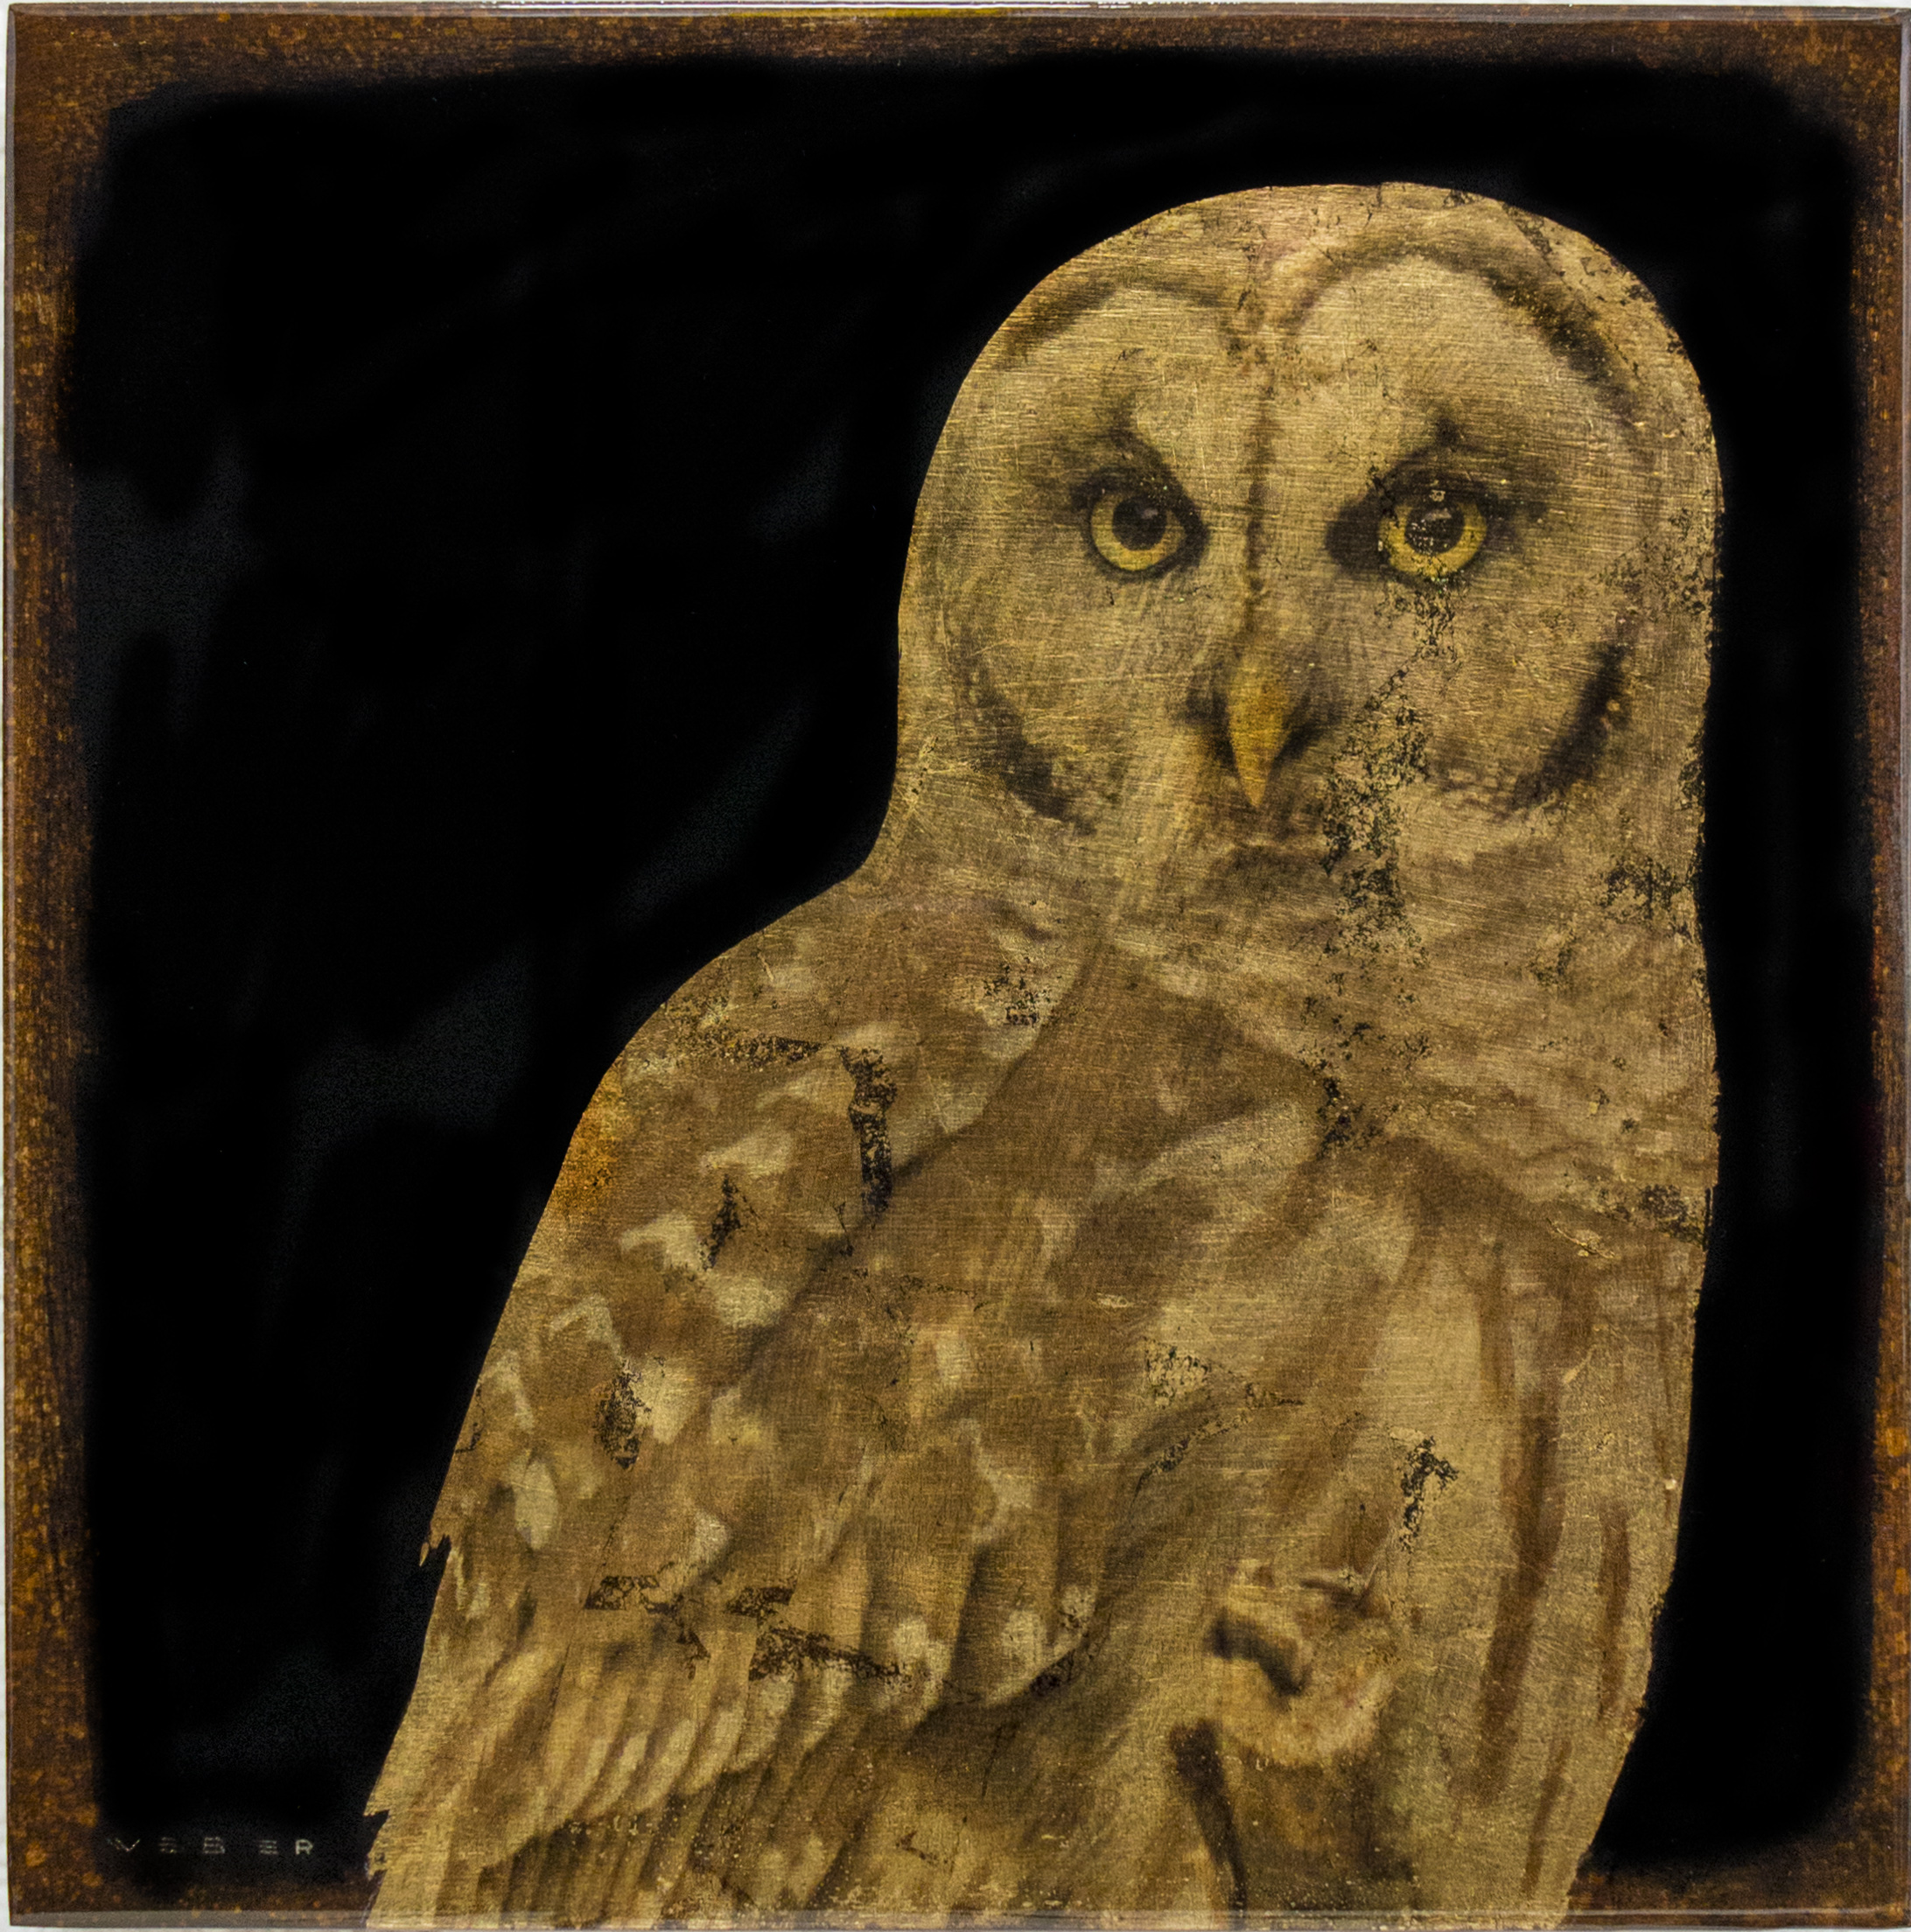 OWL, 12 X 12